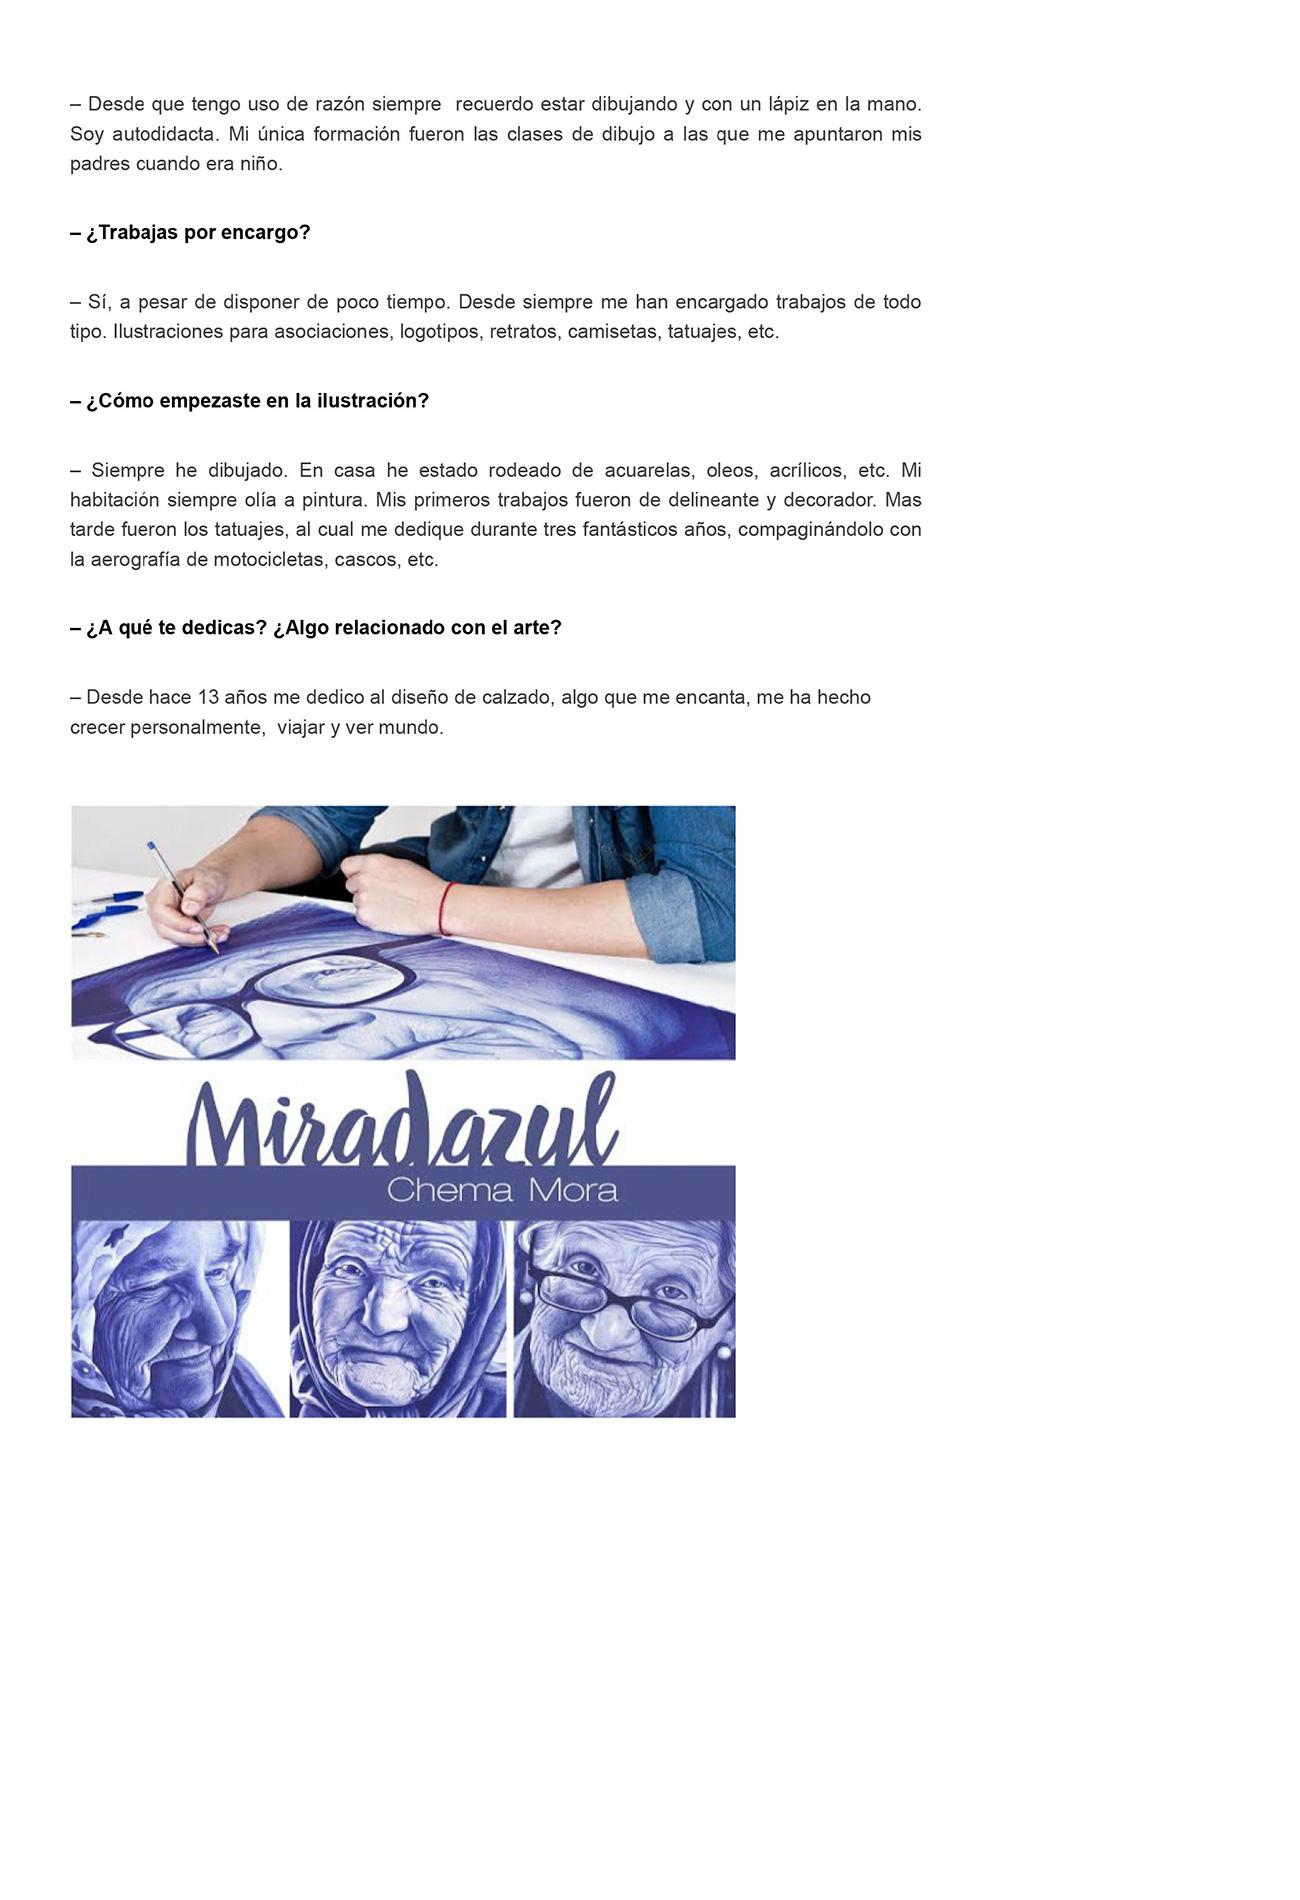 entrevista-hecula-magazine-mirada-c